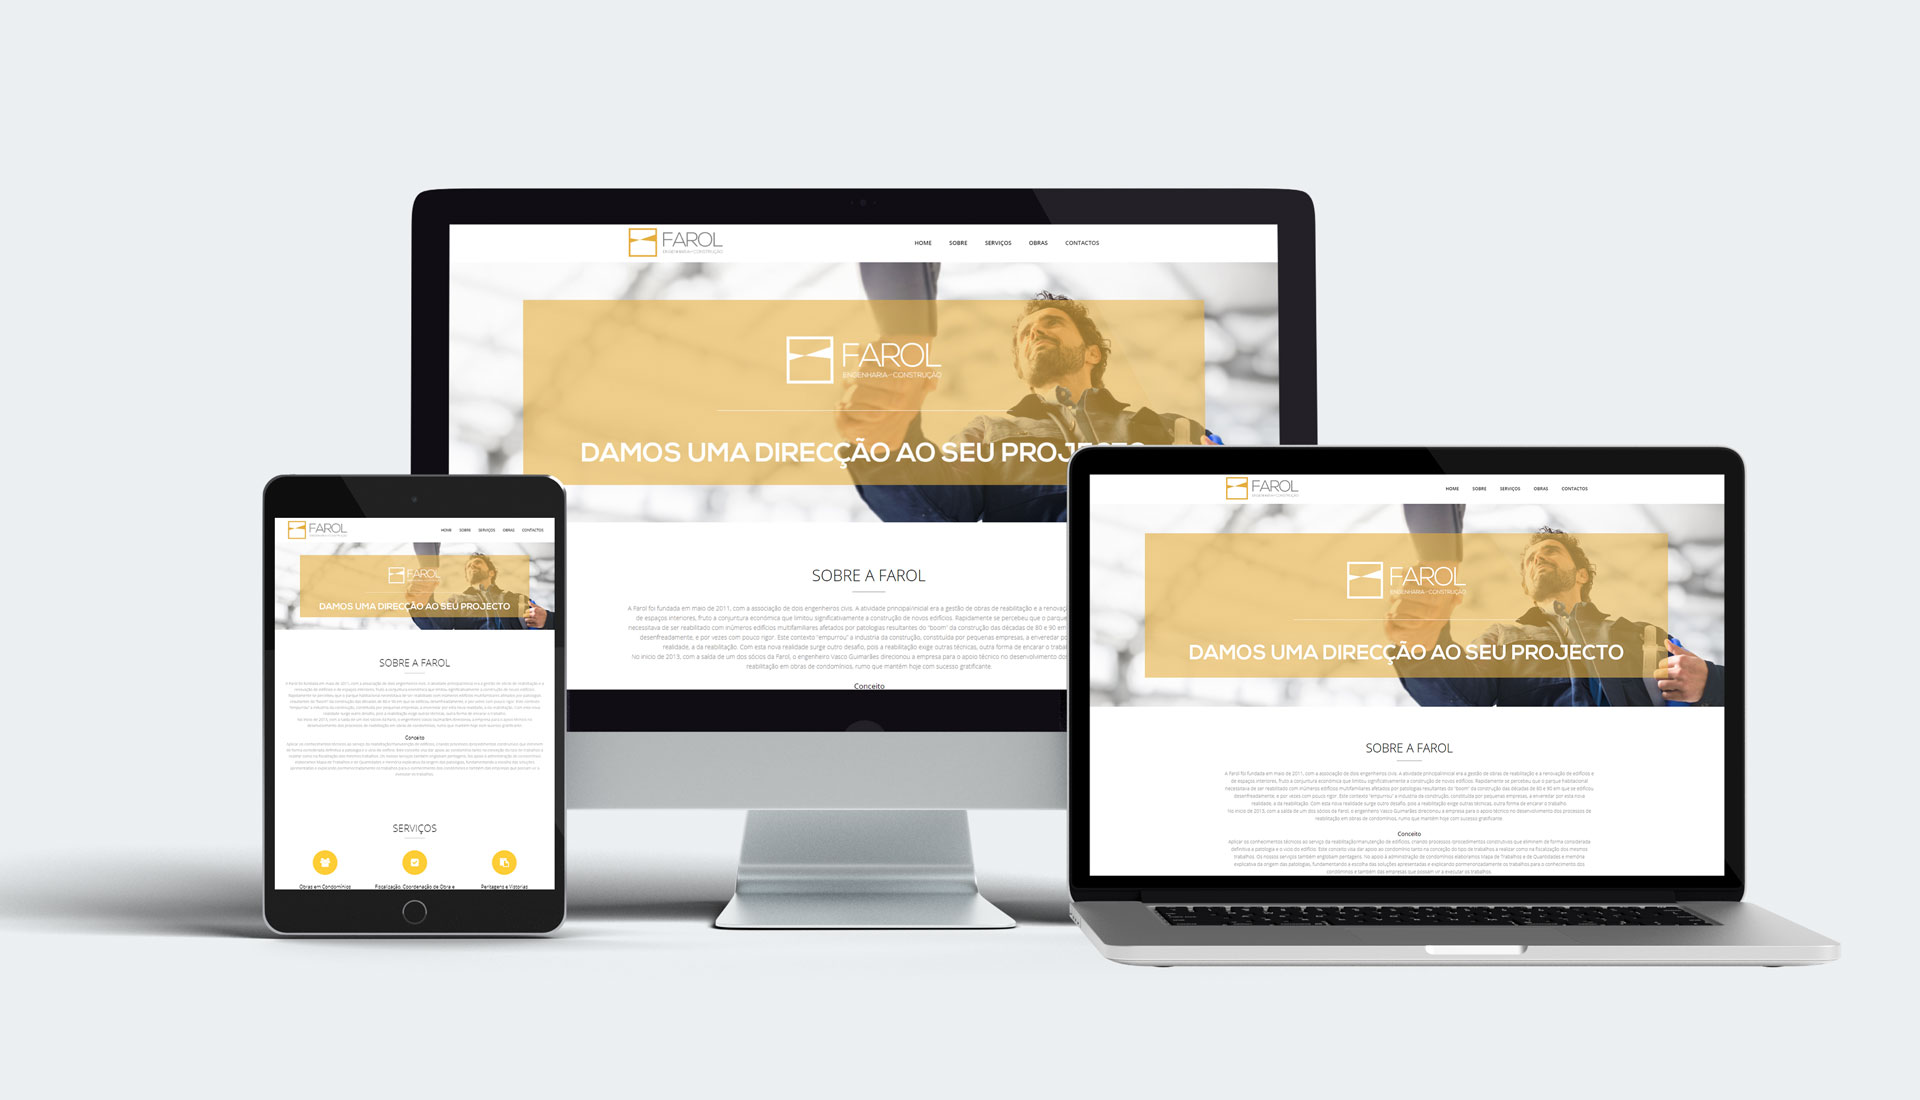 webdesign website farol engenharia